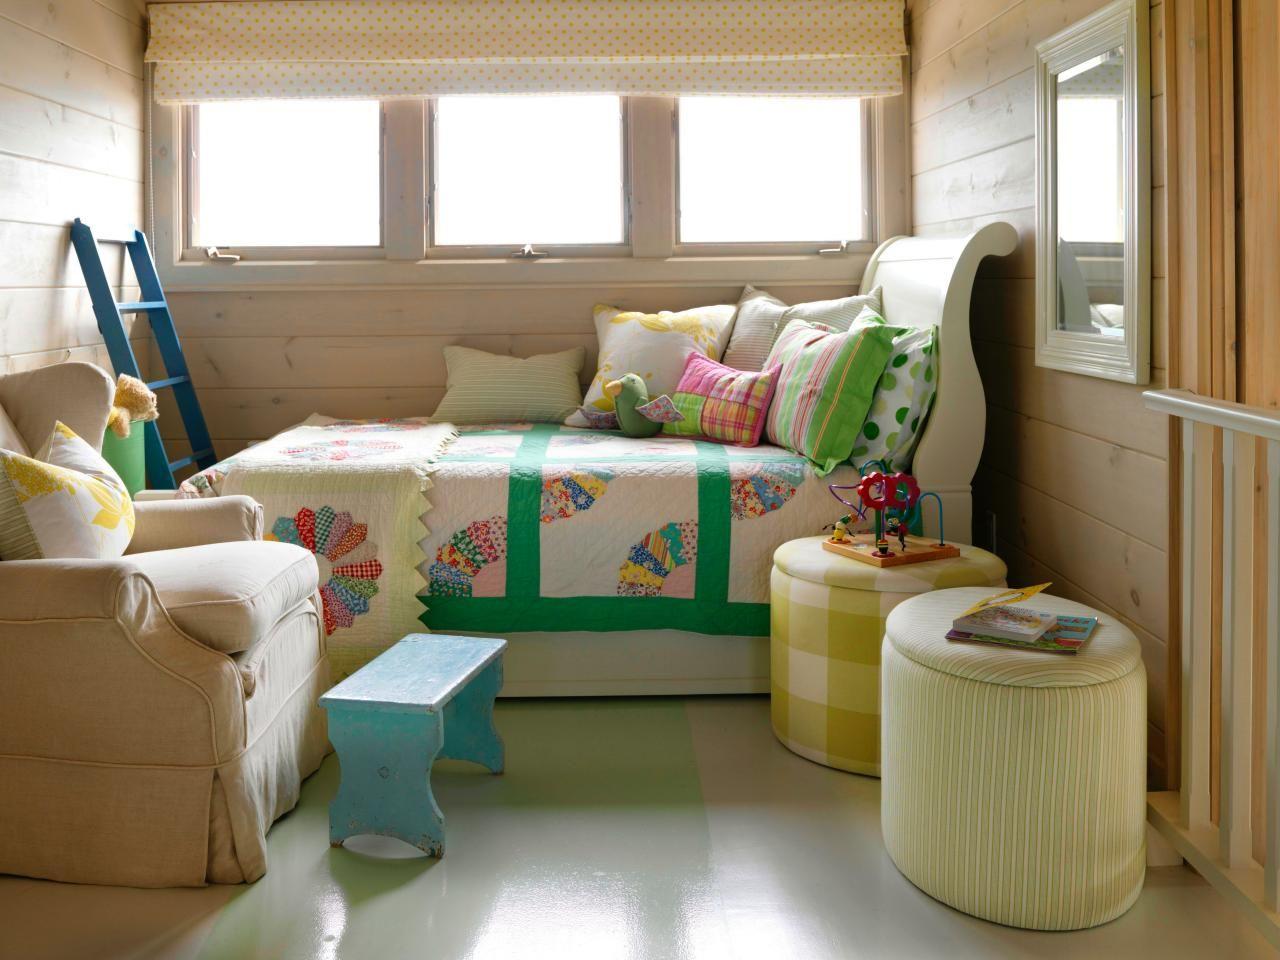 http://www.hgtv.com/shows/sarahs-house/tour-sarahs-summer-house-pictures